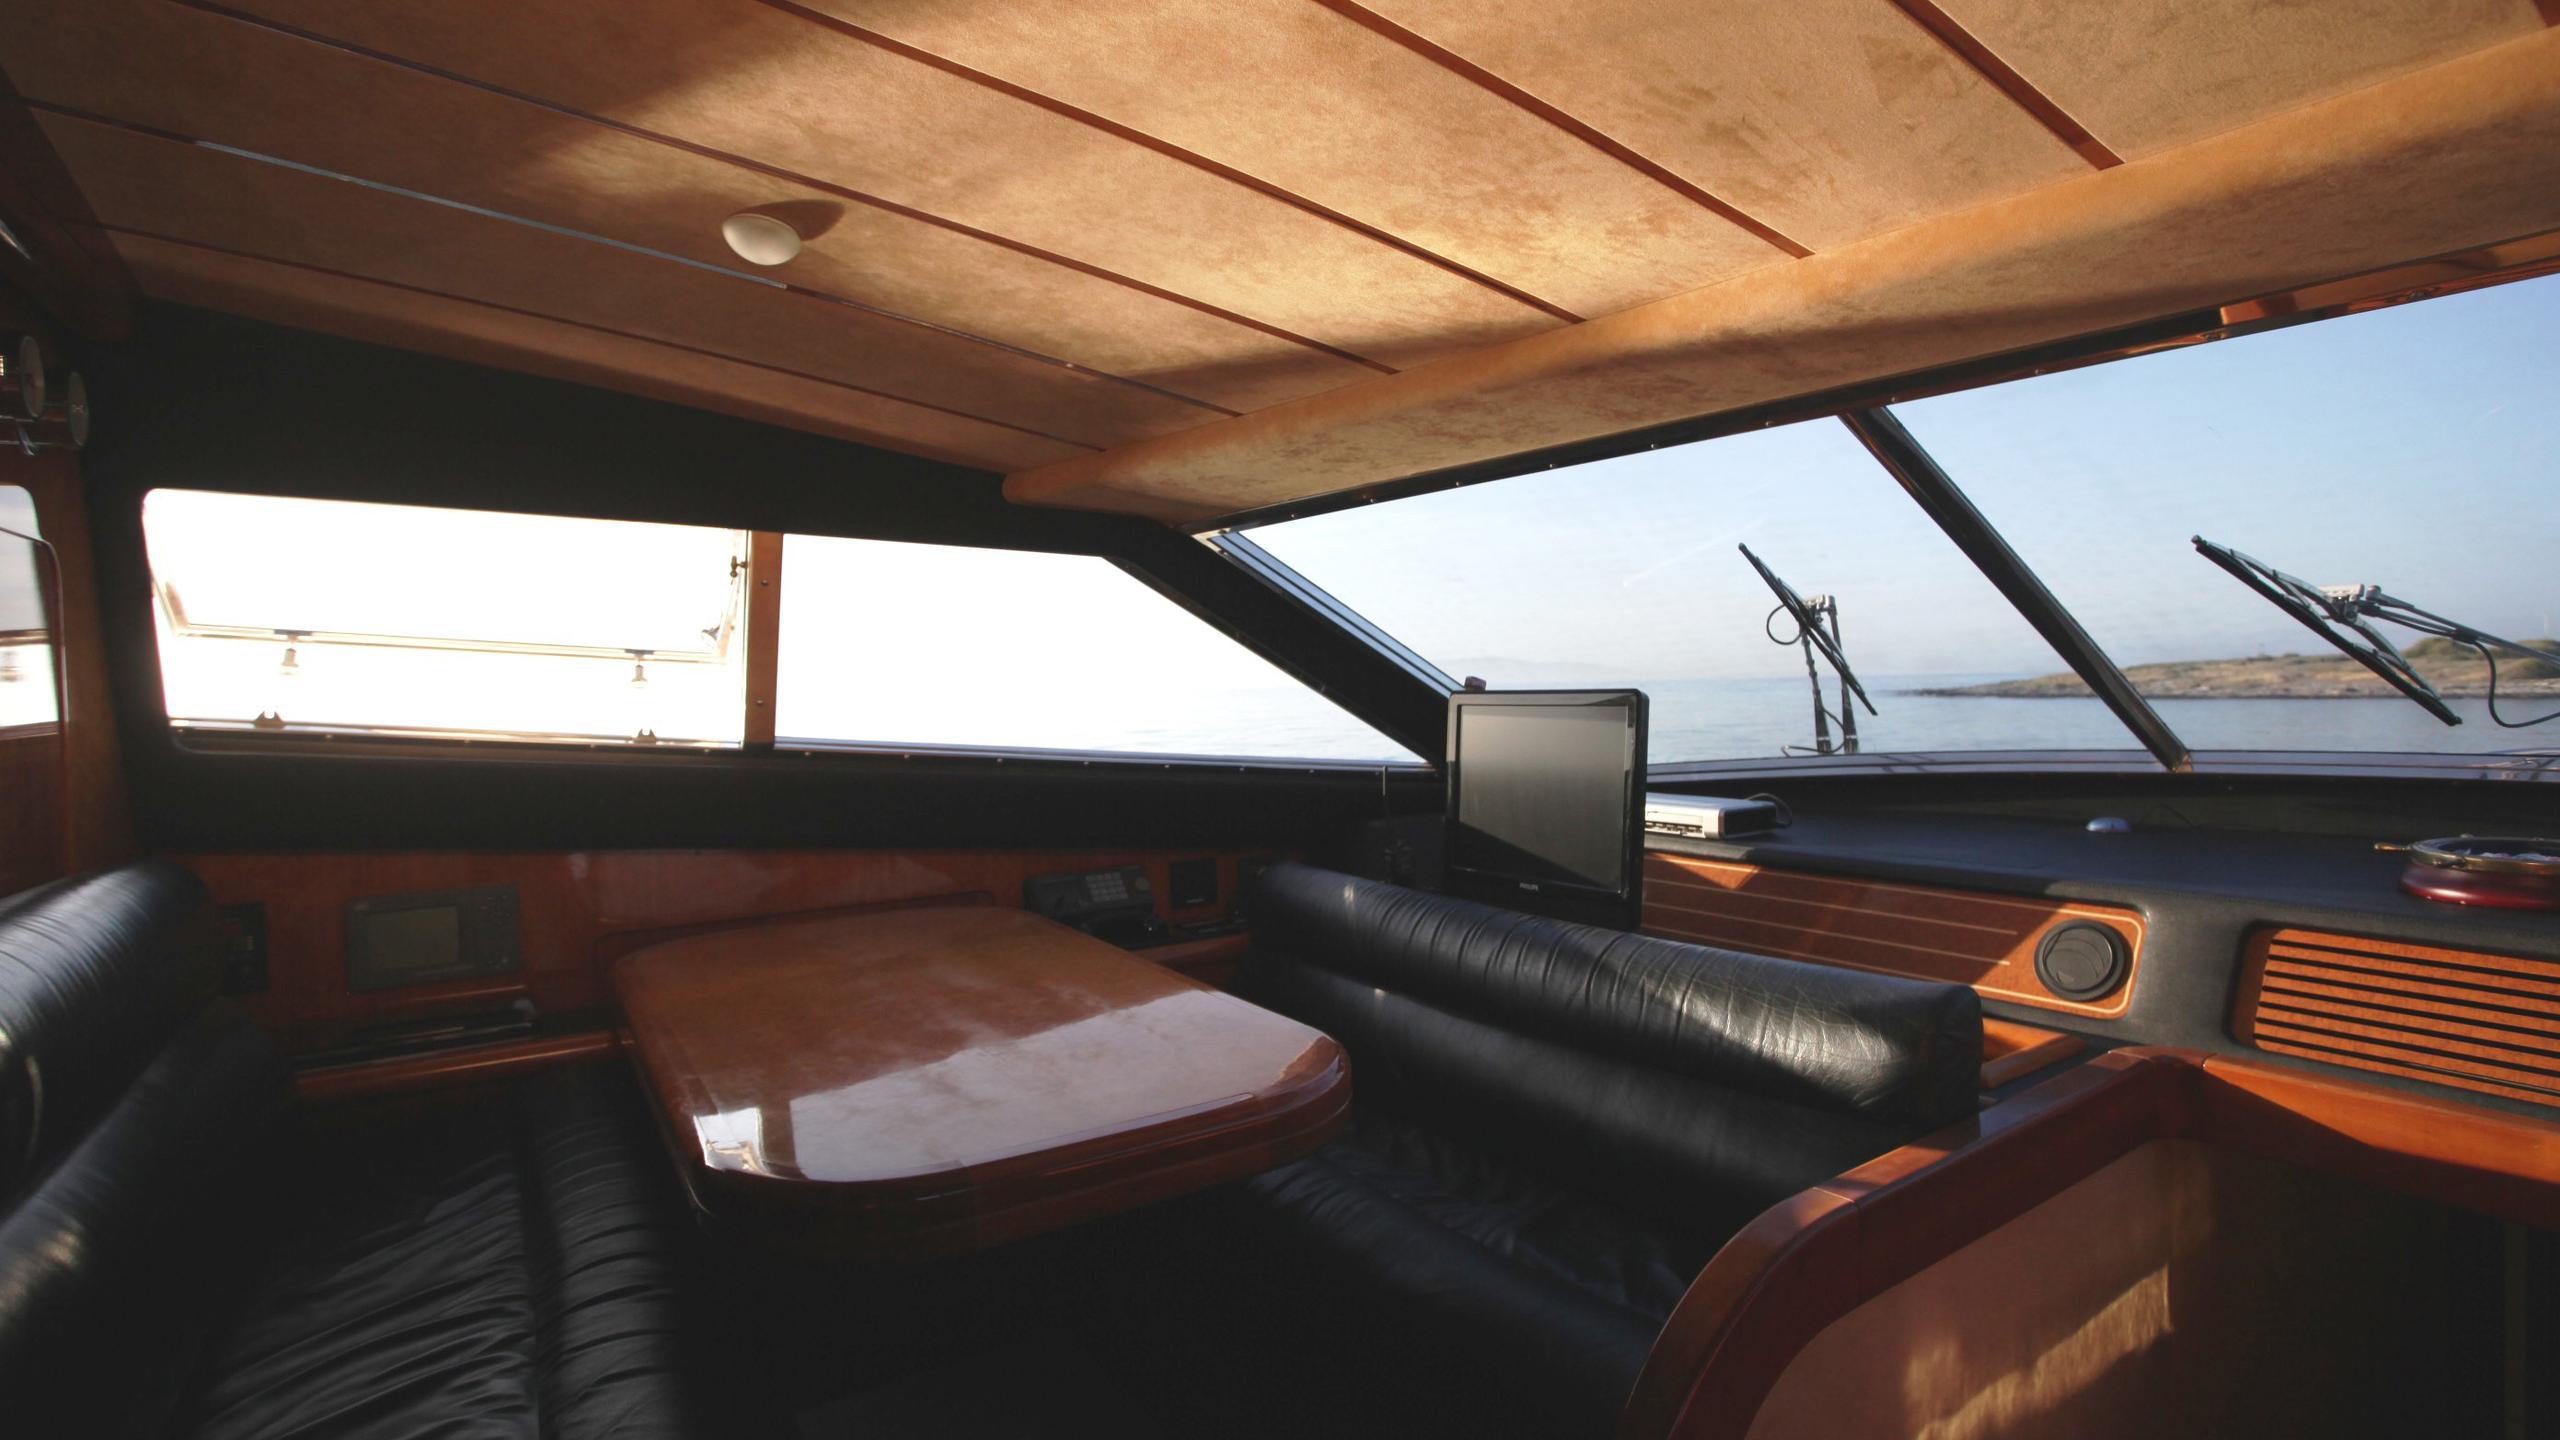 kentavros-ii-yacht-helm-seating